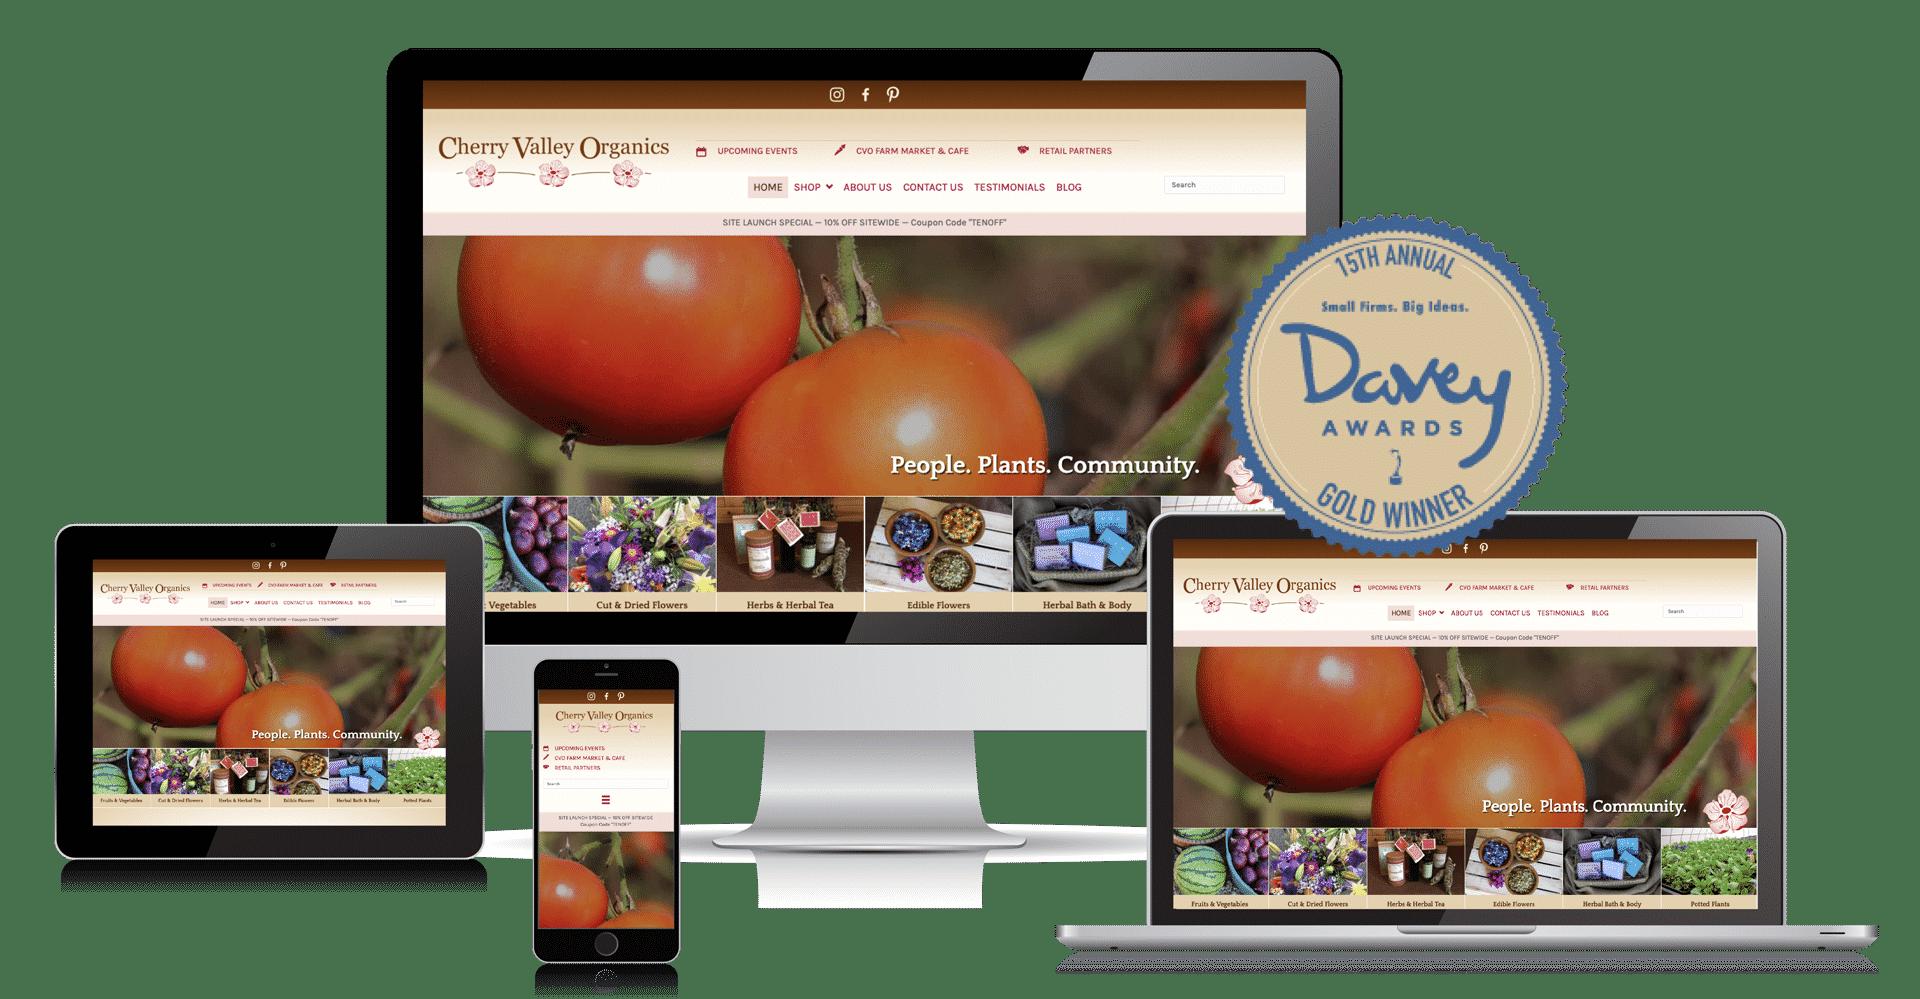 Cherry Valley Organics website